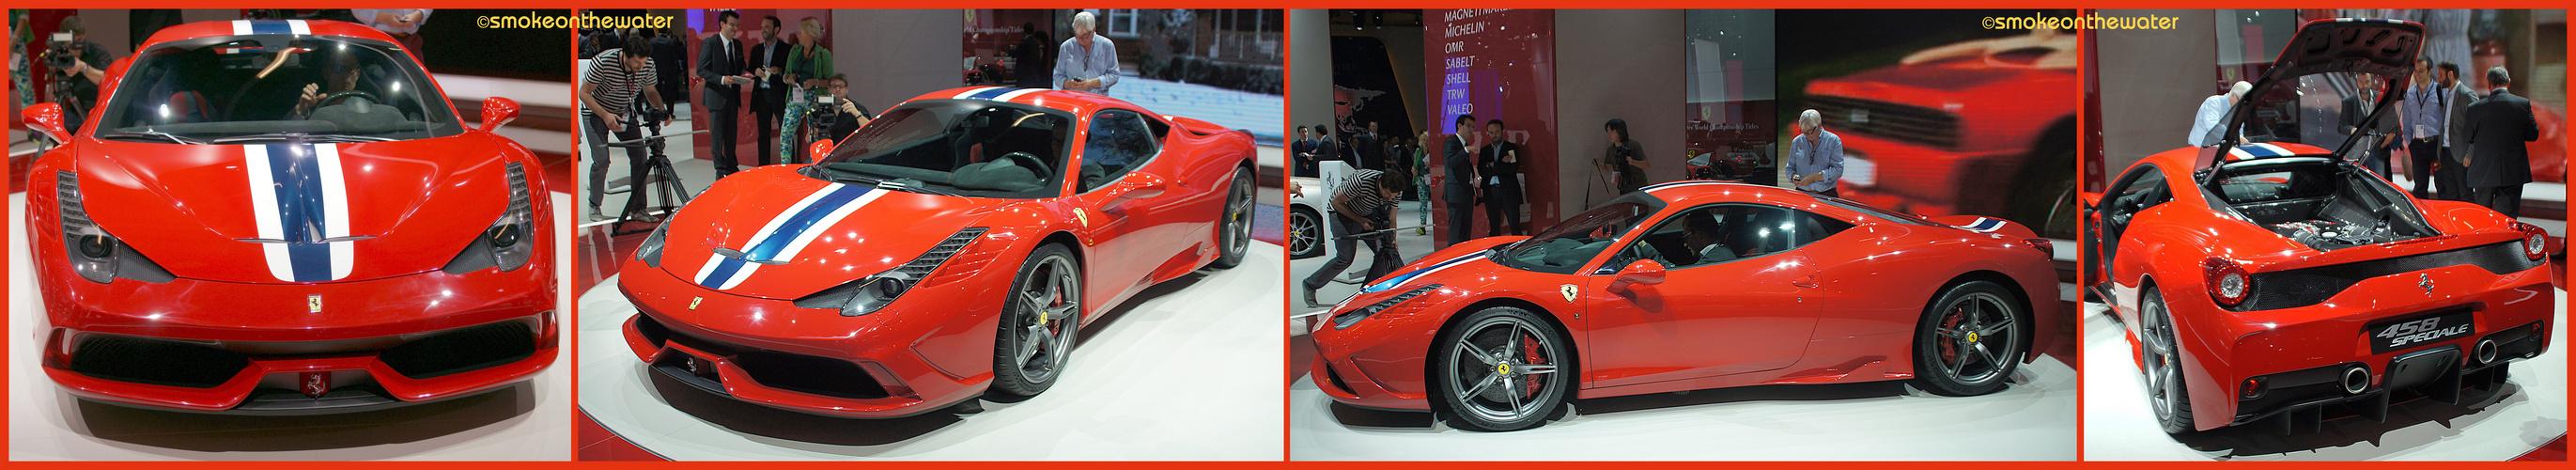 Weltpremiere: Ferrari 458 Speciale